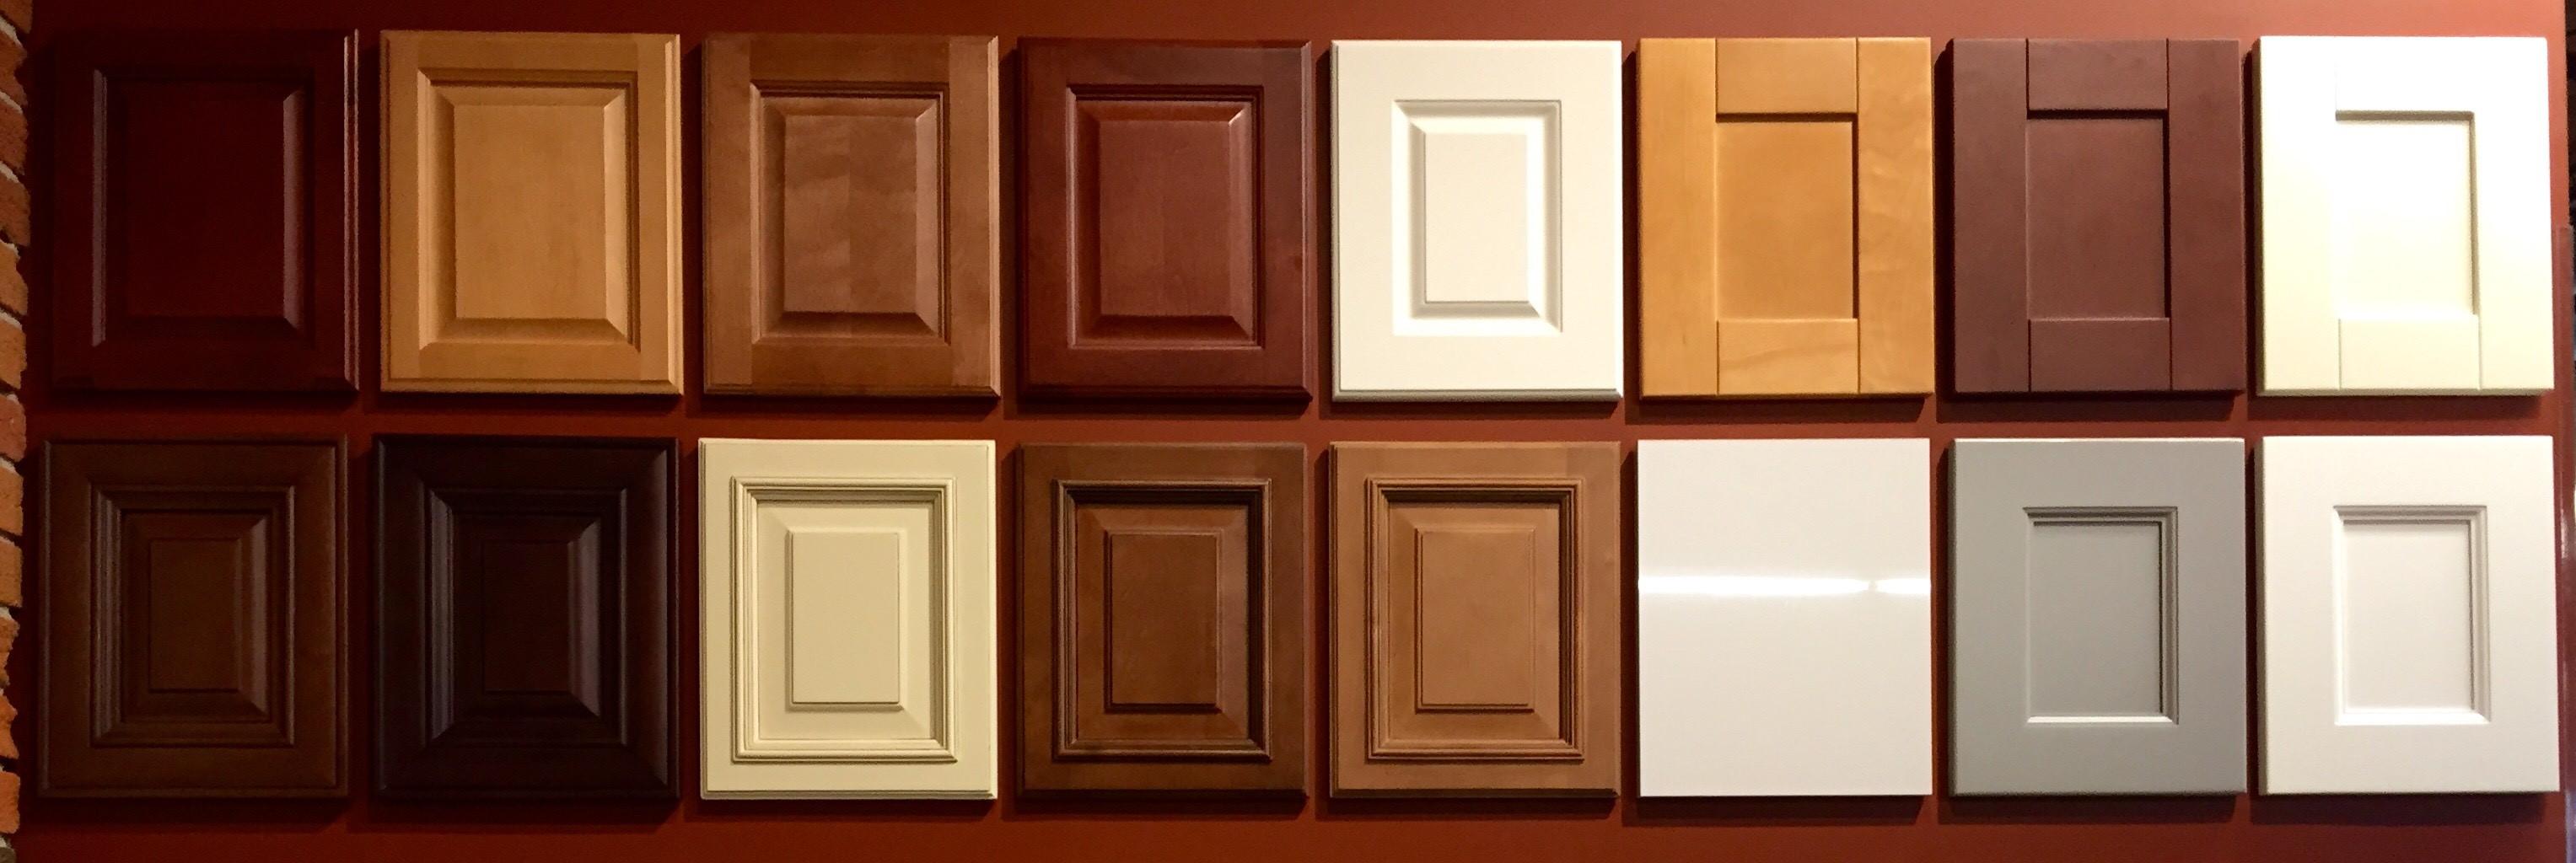 Fabuwoods New Galaxy Cabinets DesignEric